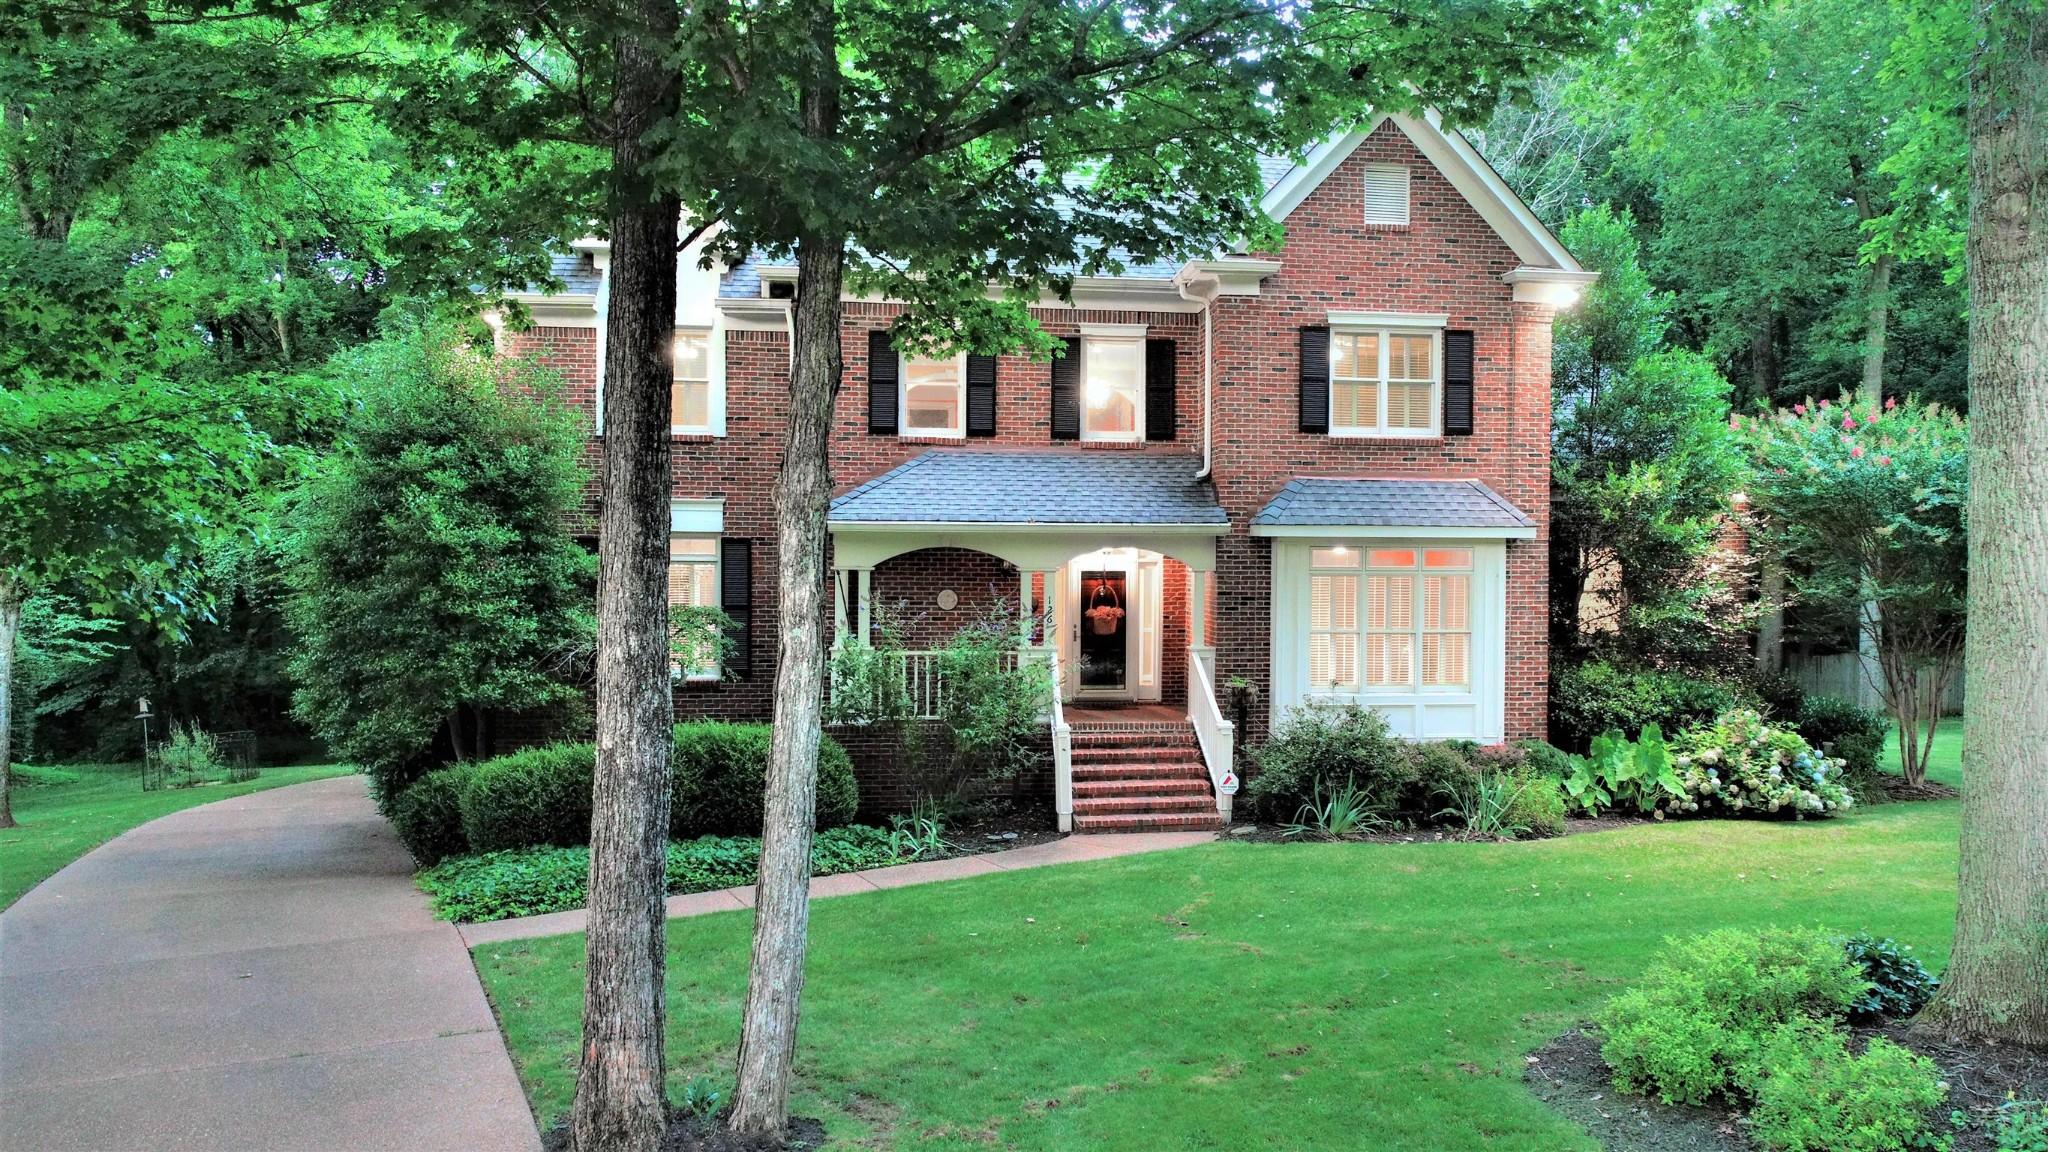 126 Laural Hill Dr, Smyrna, TN 37167 - Smyrna, TN real estate listing